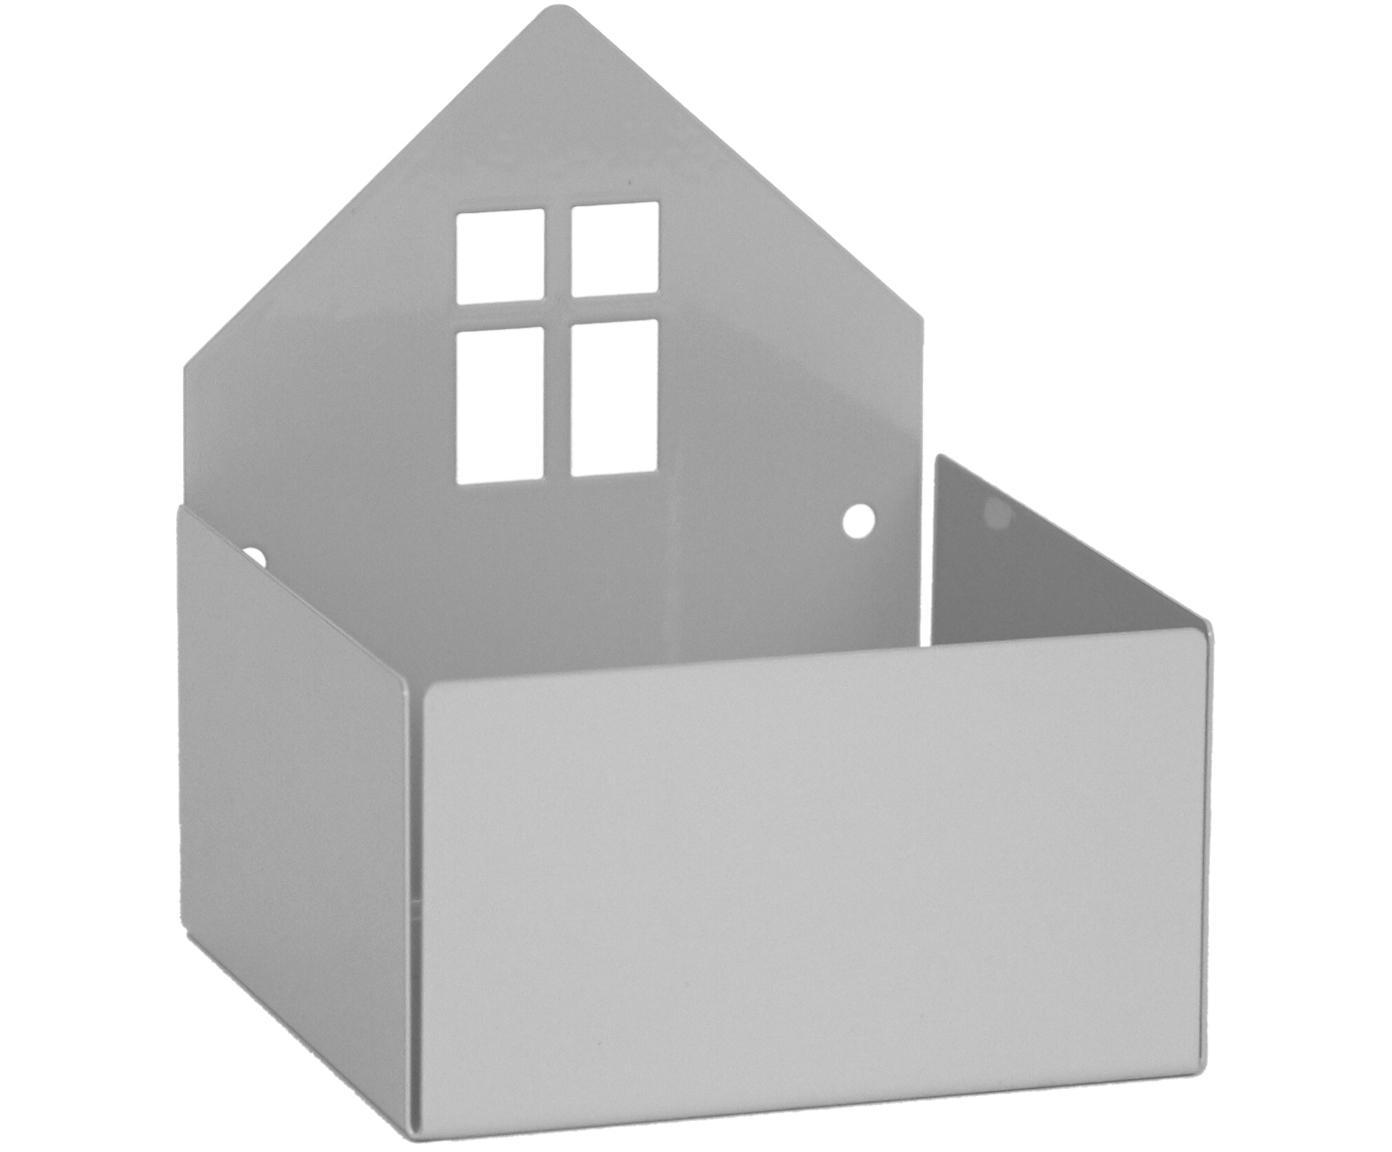 Caja Town House, Metal con pintura en polvo, Gris, An 11 x Al 13 cm